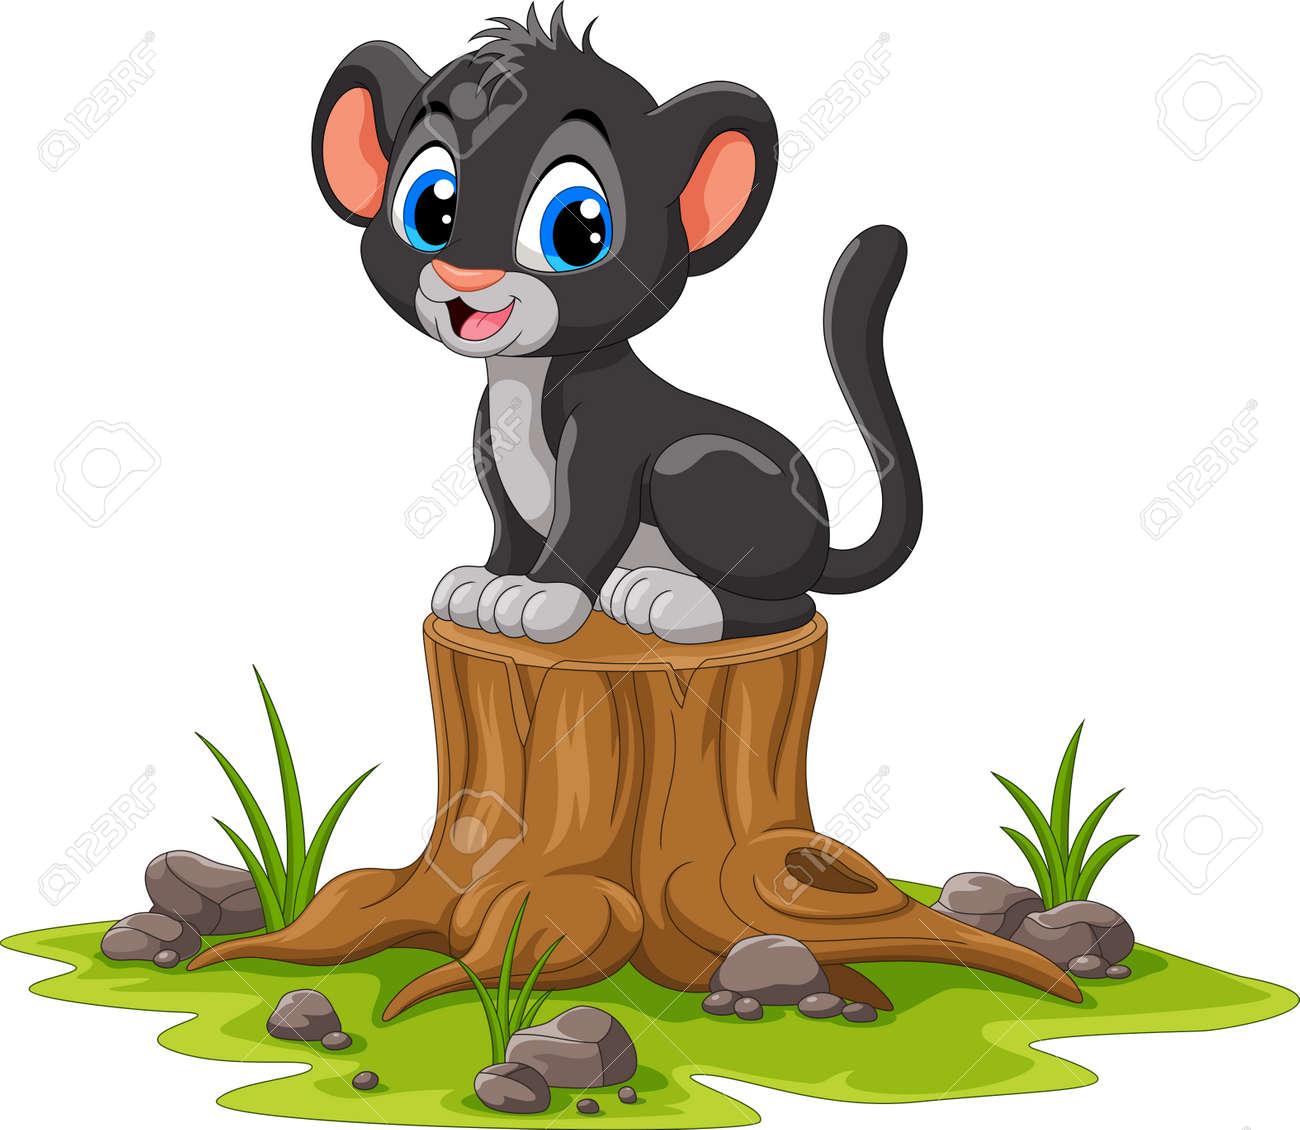 Cartoon happy panther sitting on tree stump - 165285552